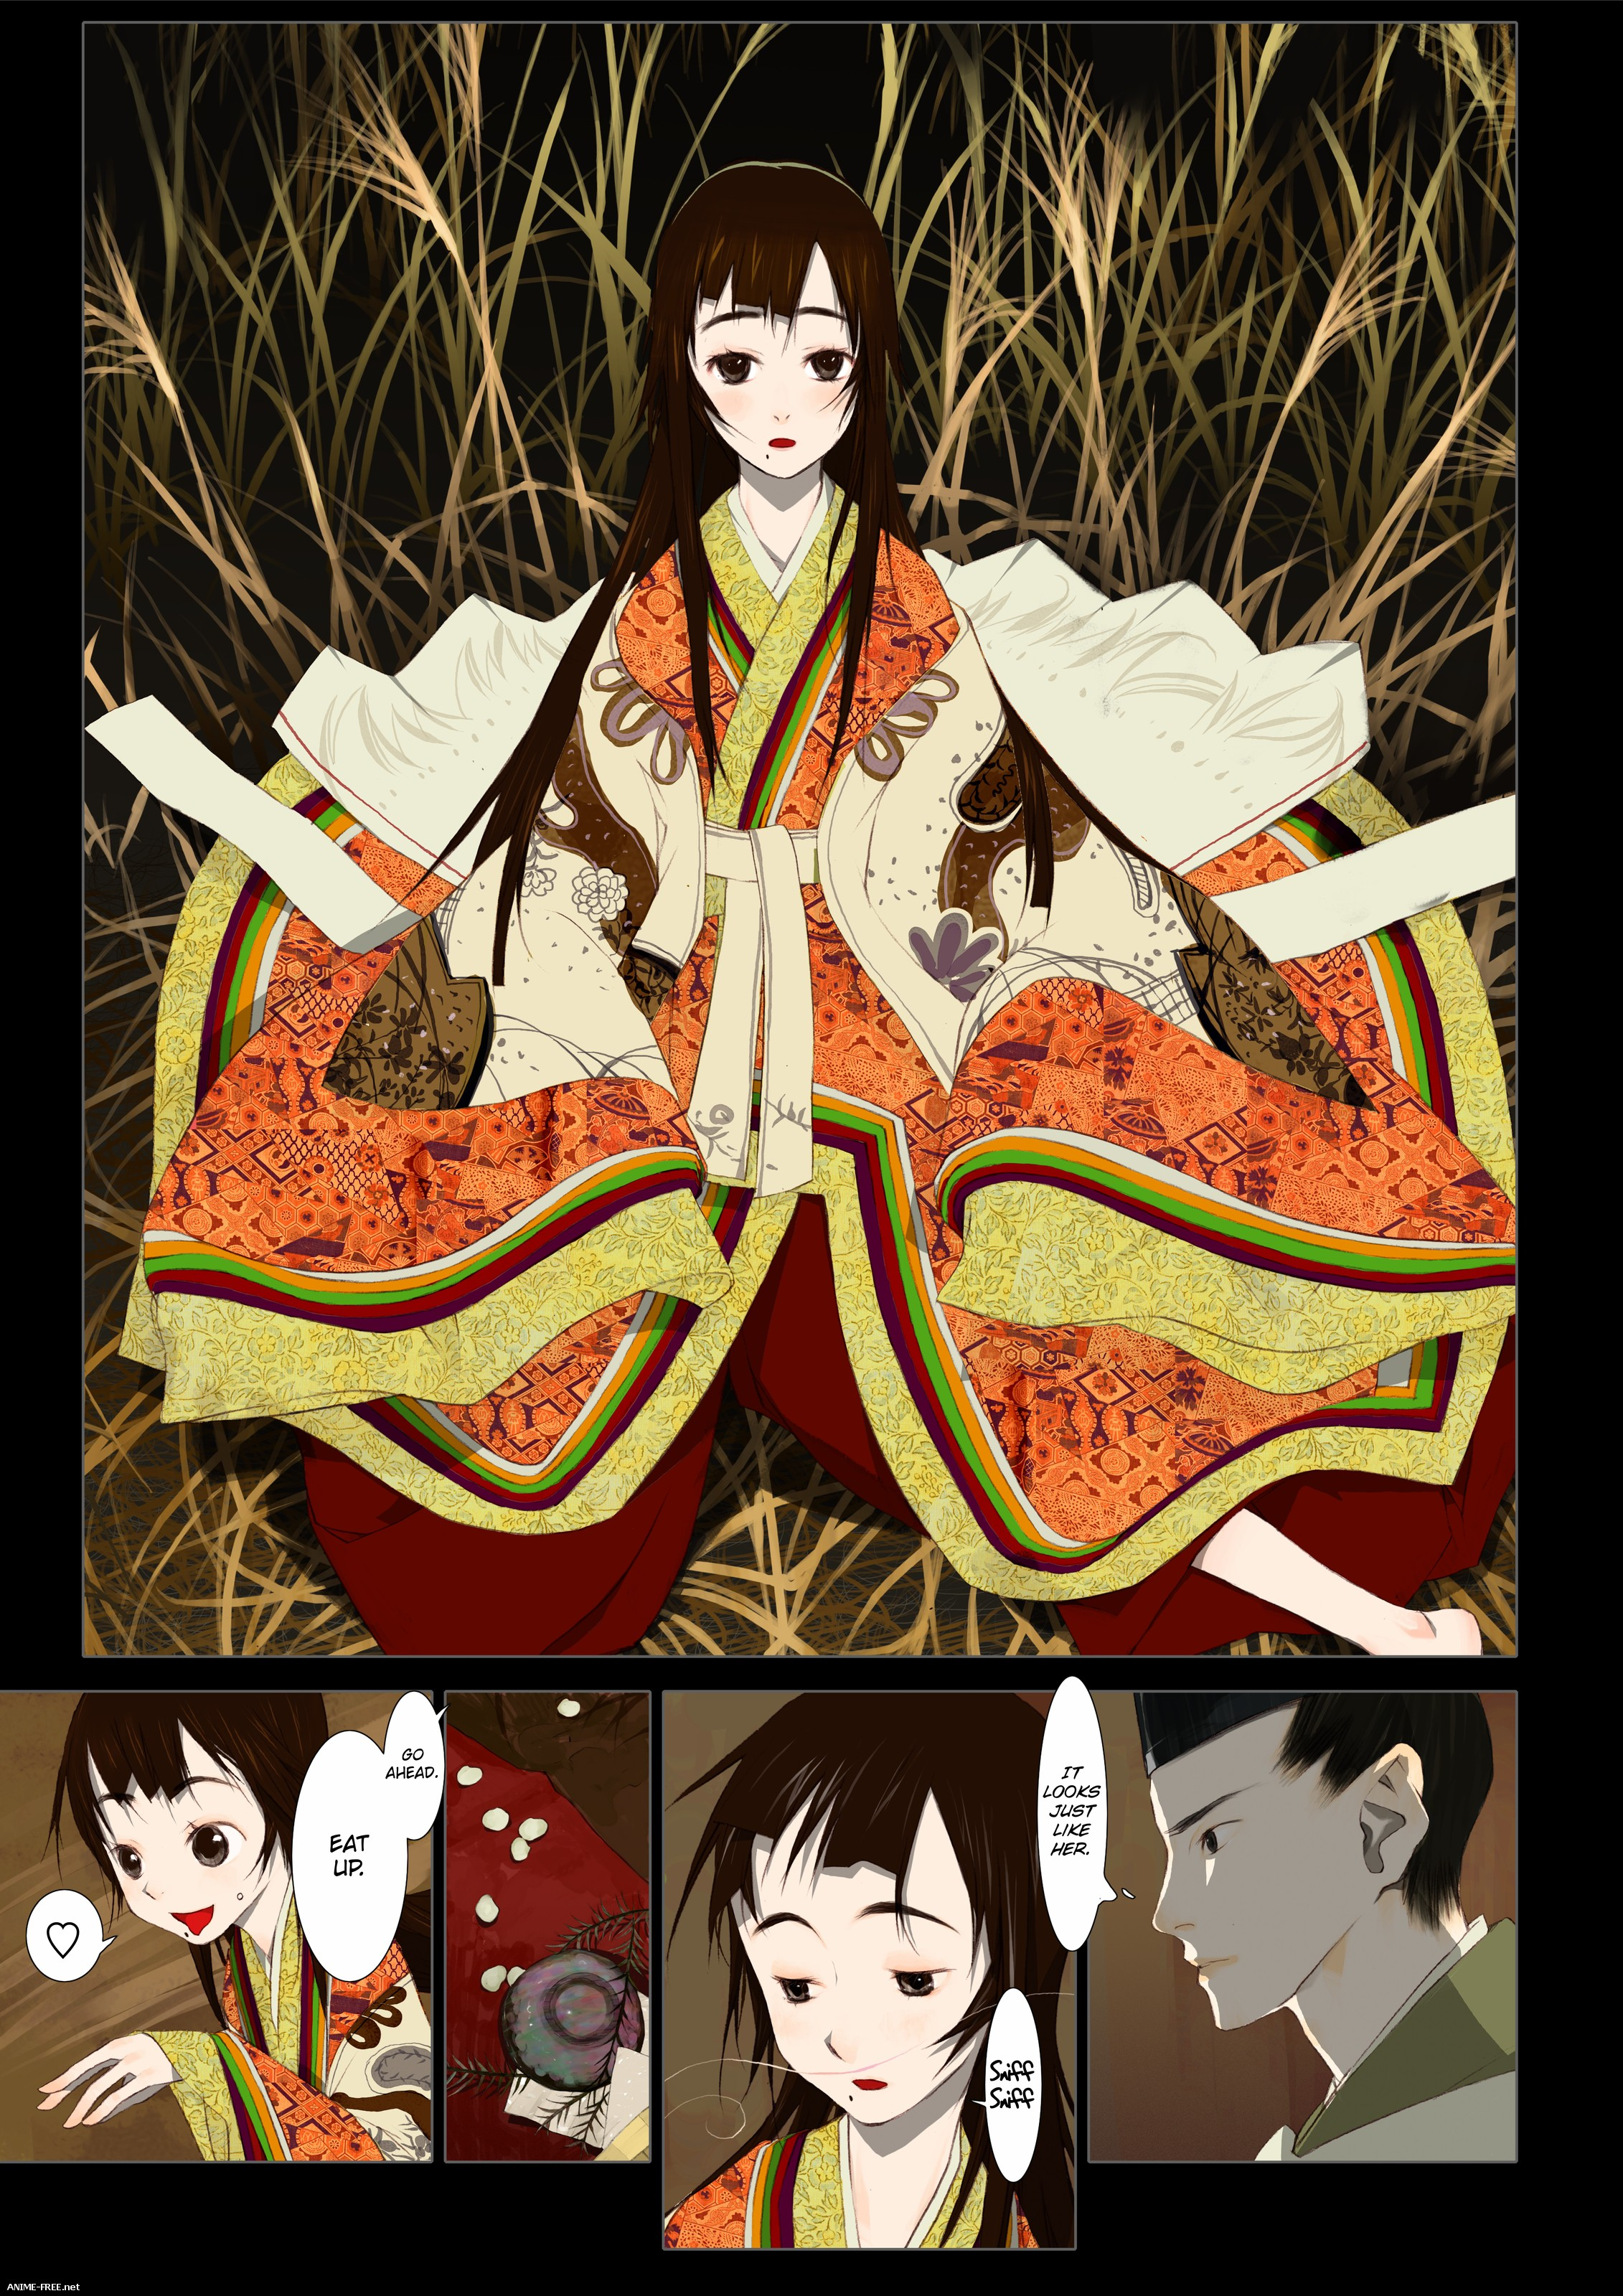 Okama - Сборник хентай манги [Ptcen] [ENG,JAP] Manga Hentai